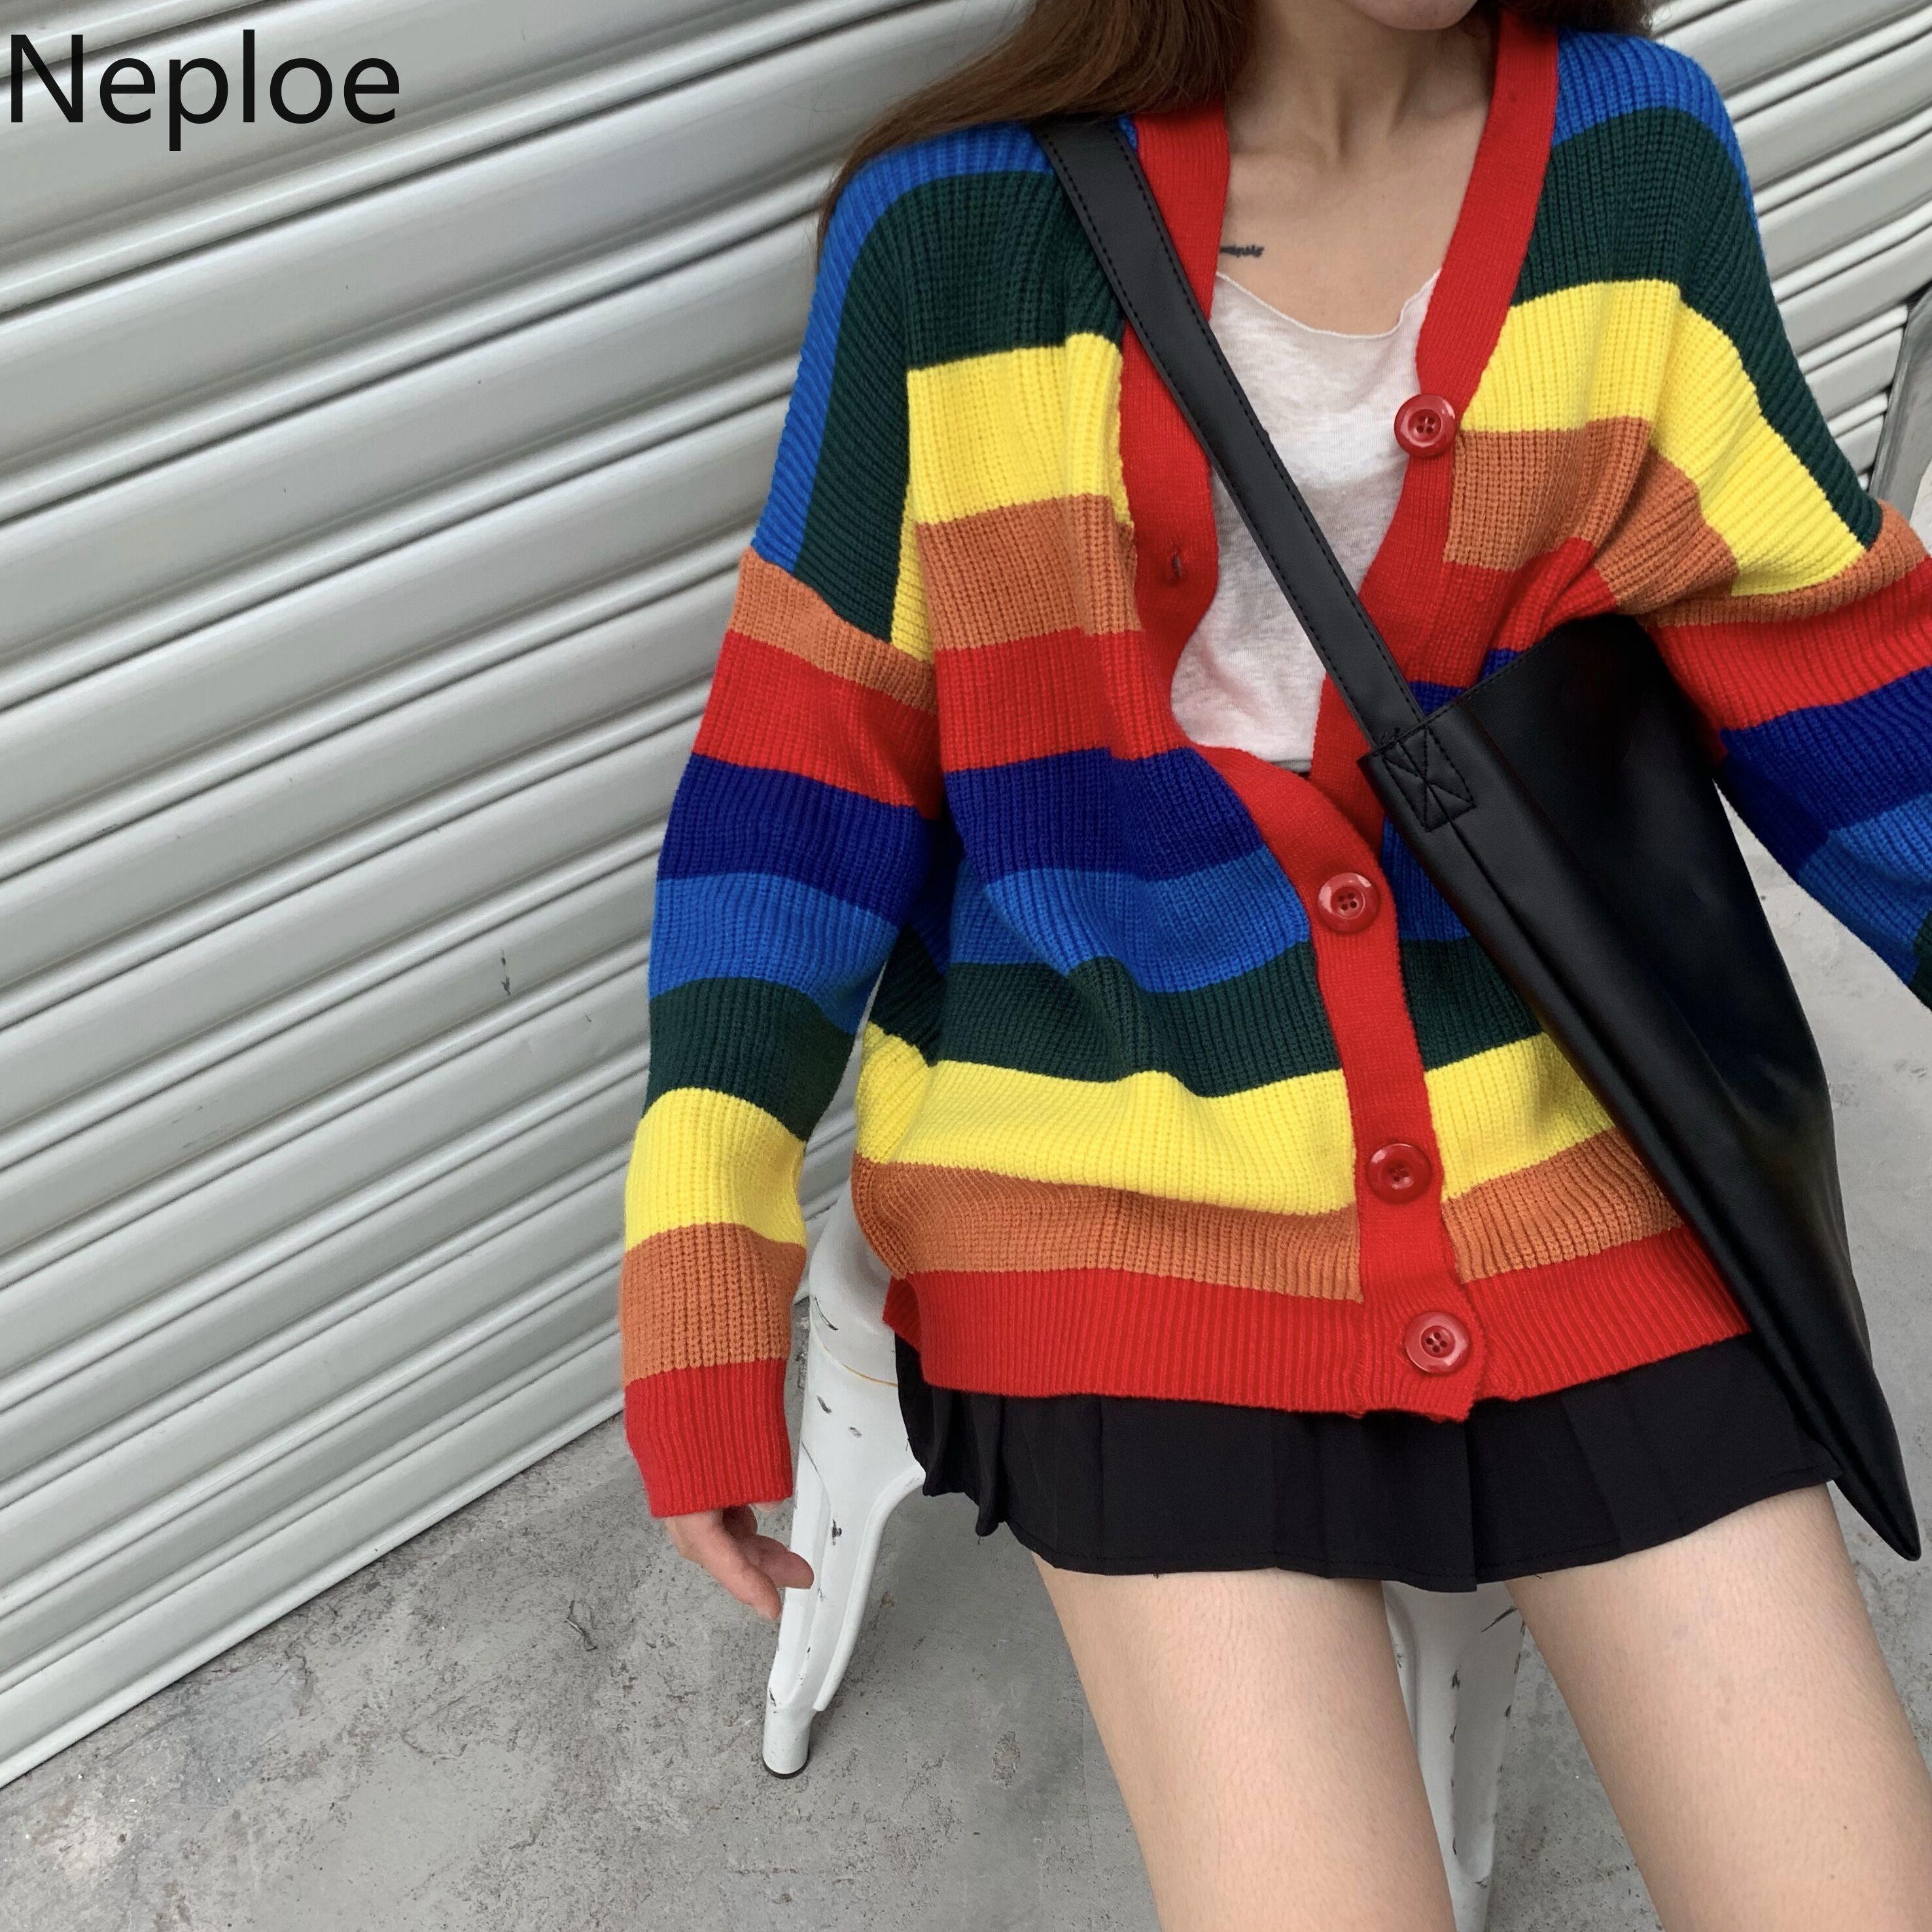 Neploe Knit Cardigan V-Neck sweater Rainbow Coat Jacket Jumper Pull Long-Sleeve Medium-Long